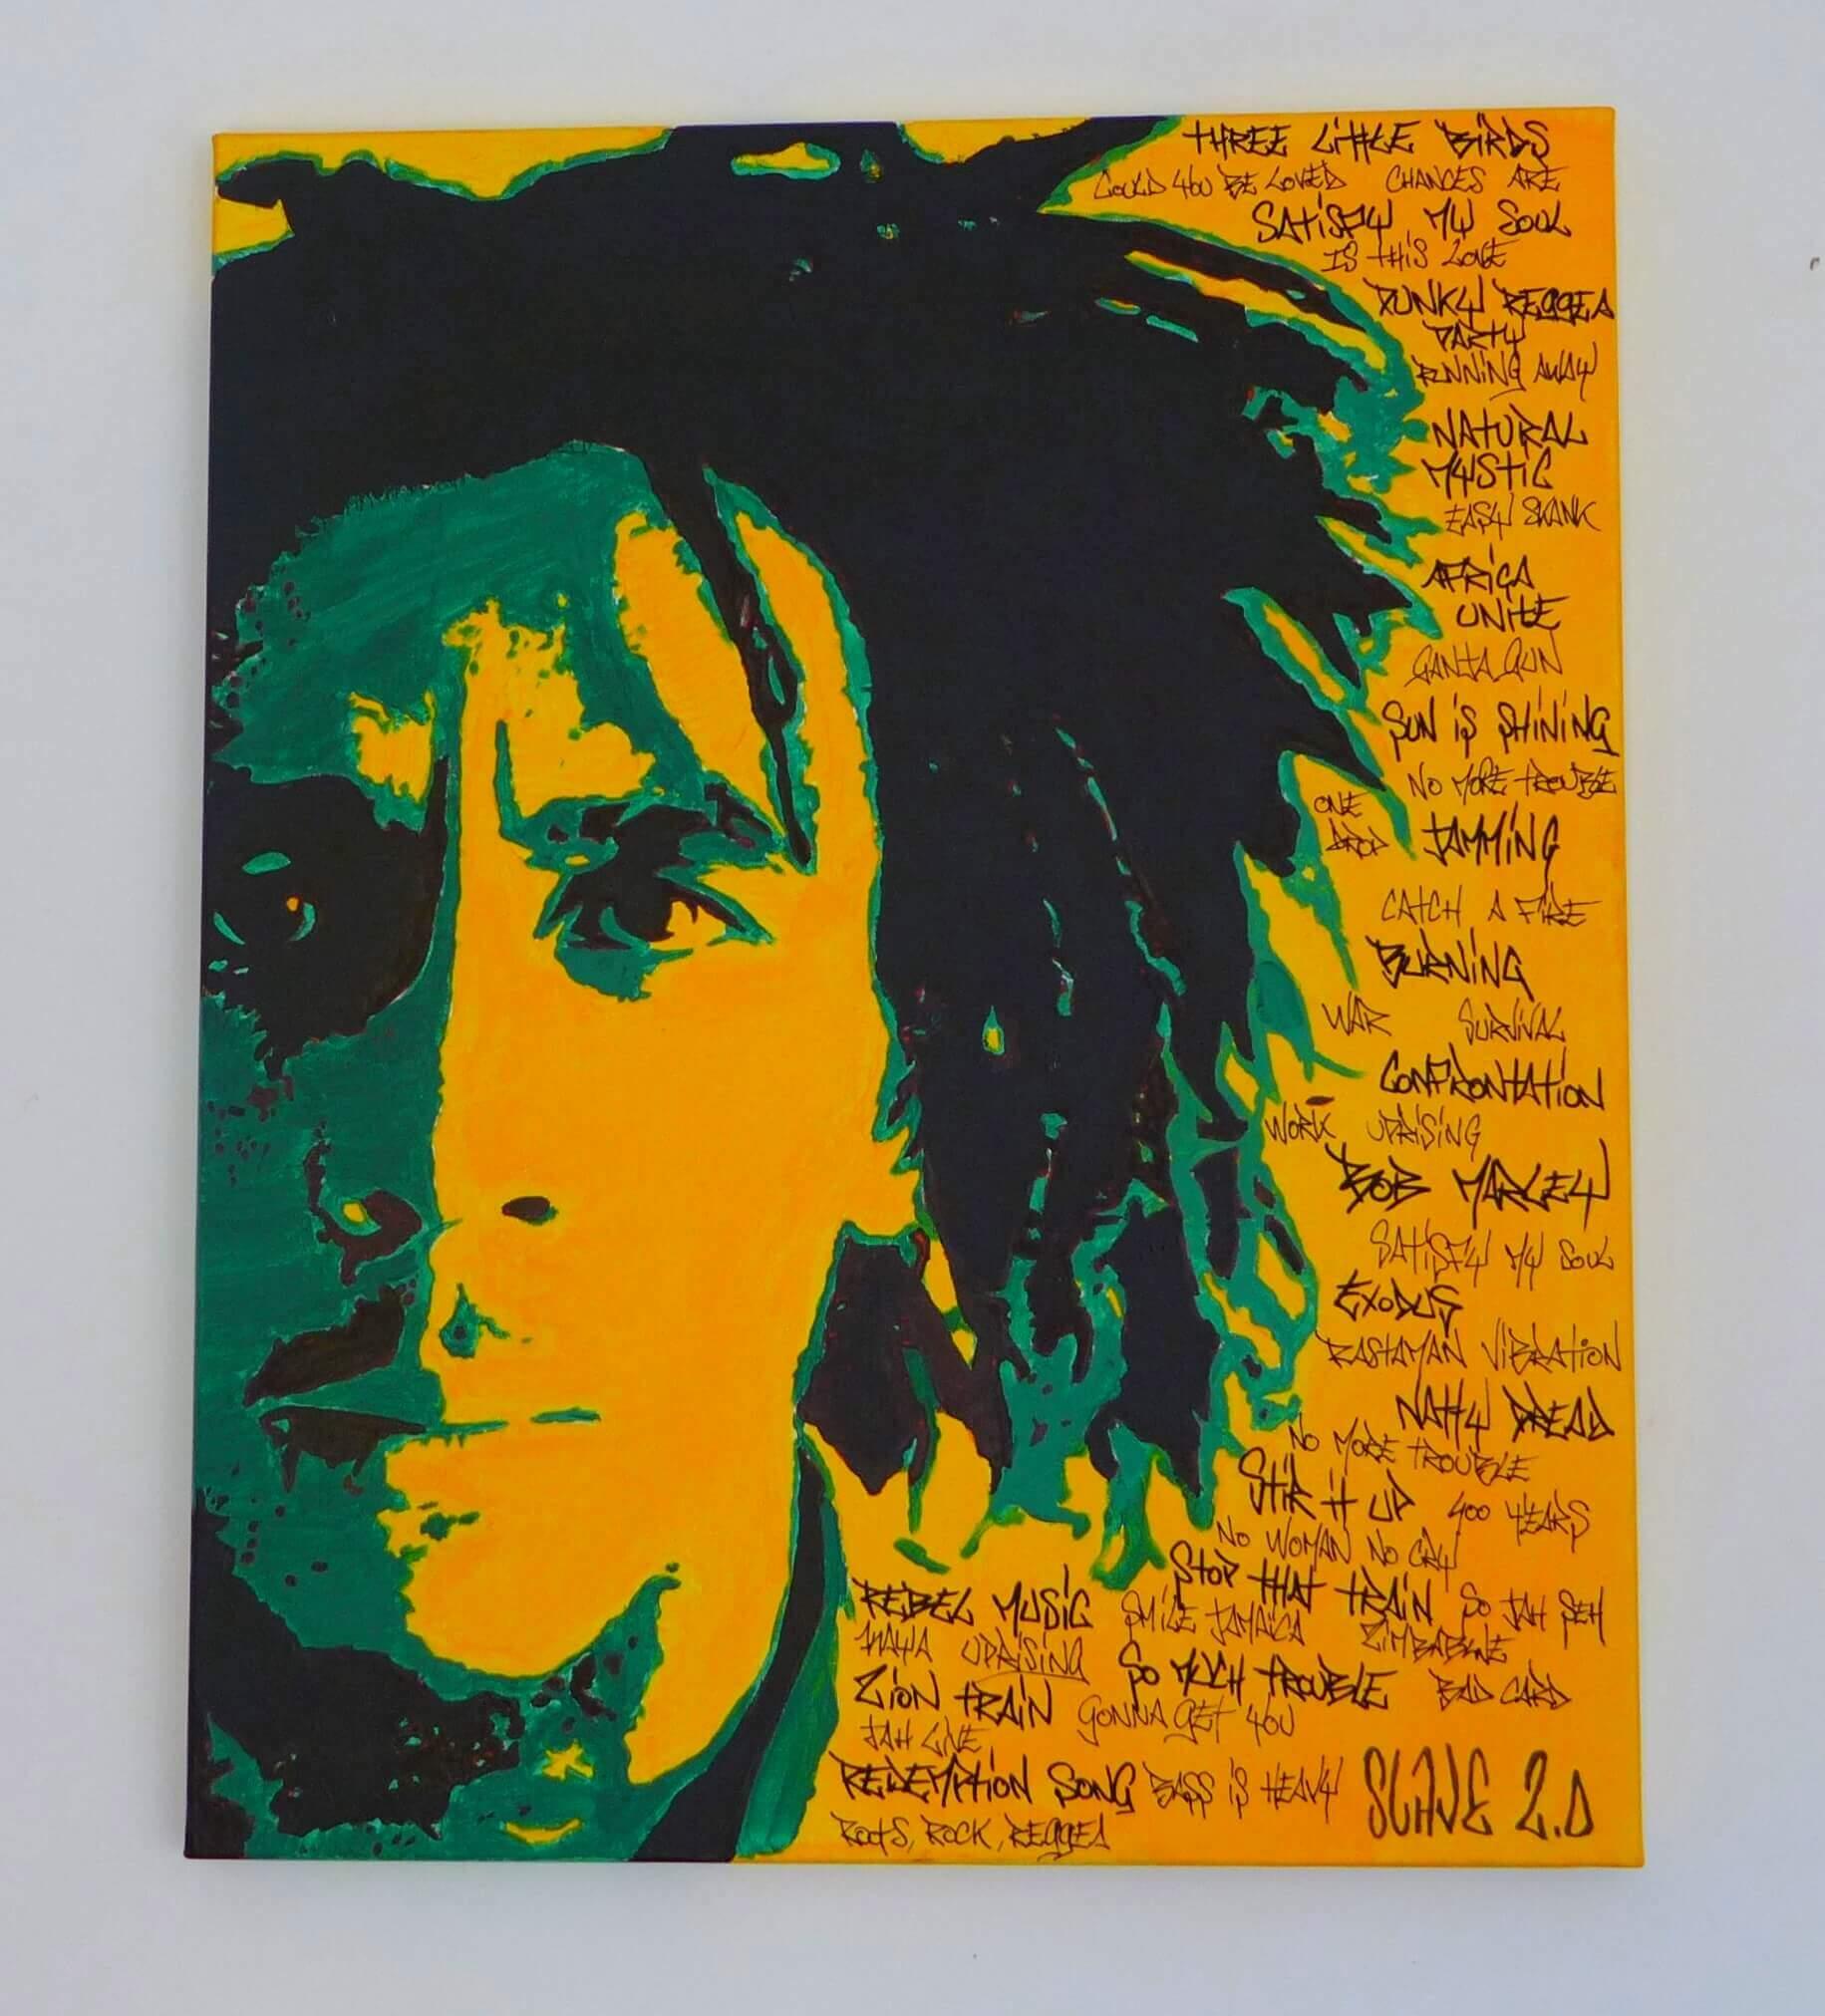 Bob Marley- Rebel Music - tableau street art - Slave 2.0